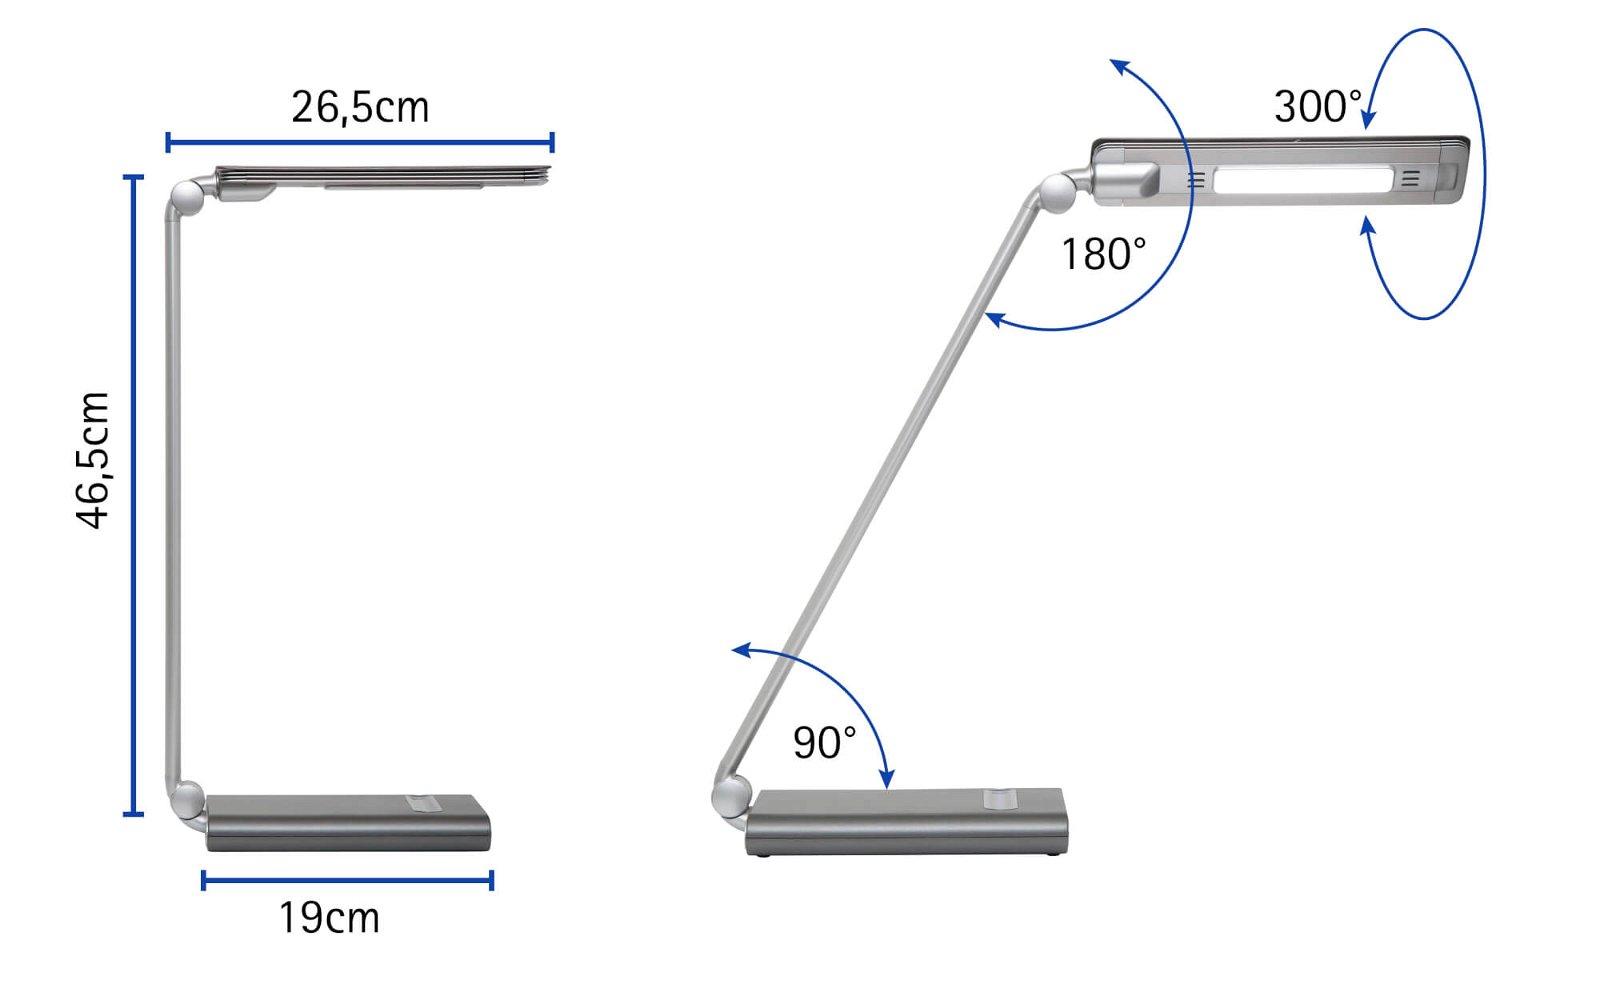 LED-Tischleuchte MAULpure, dimmbar, silber